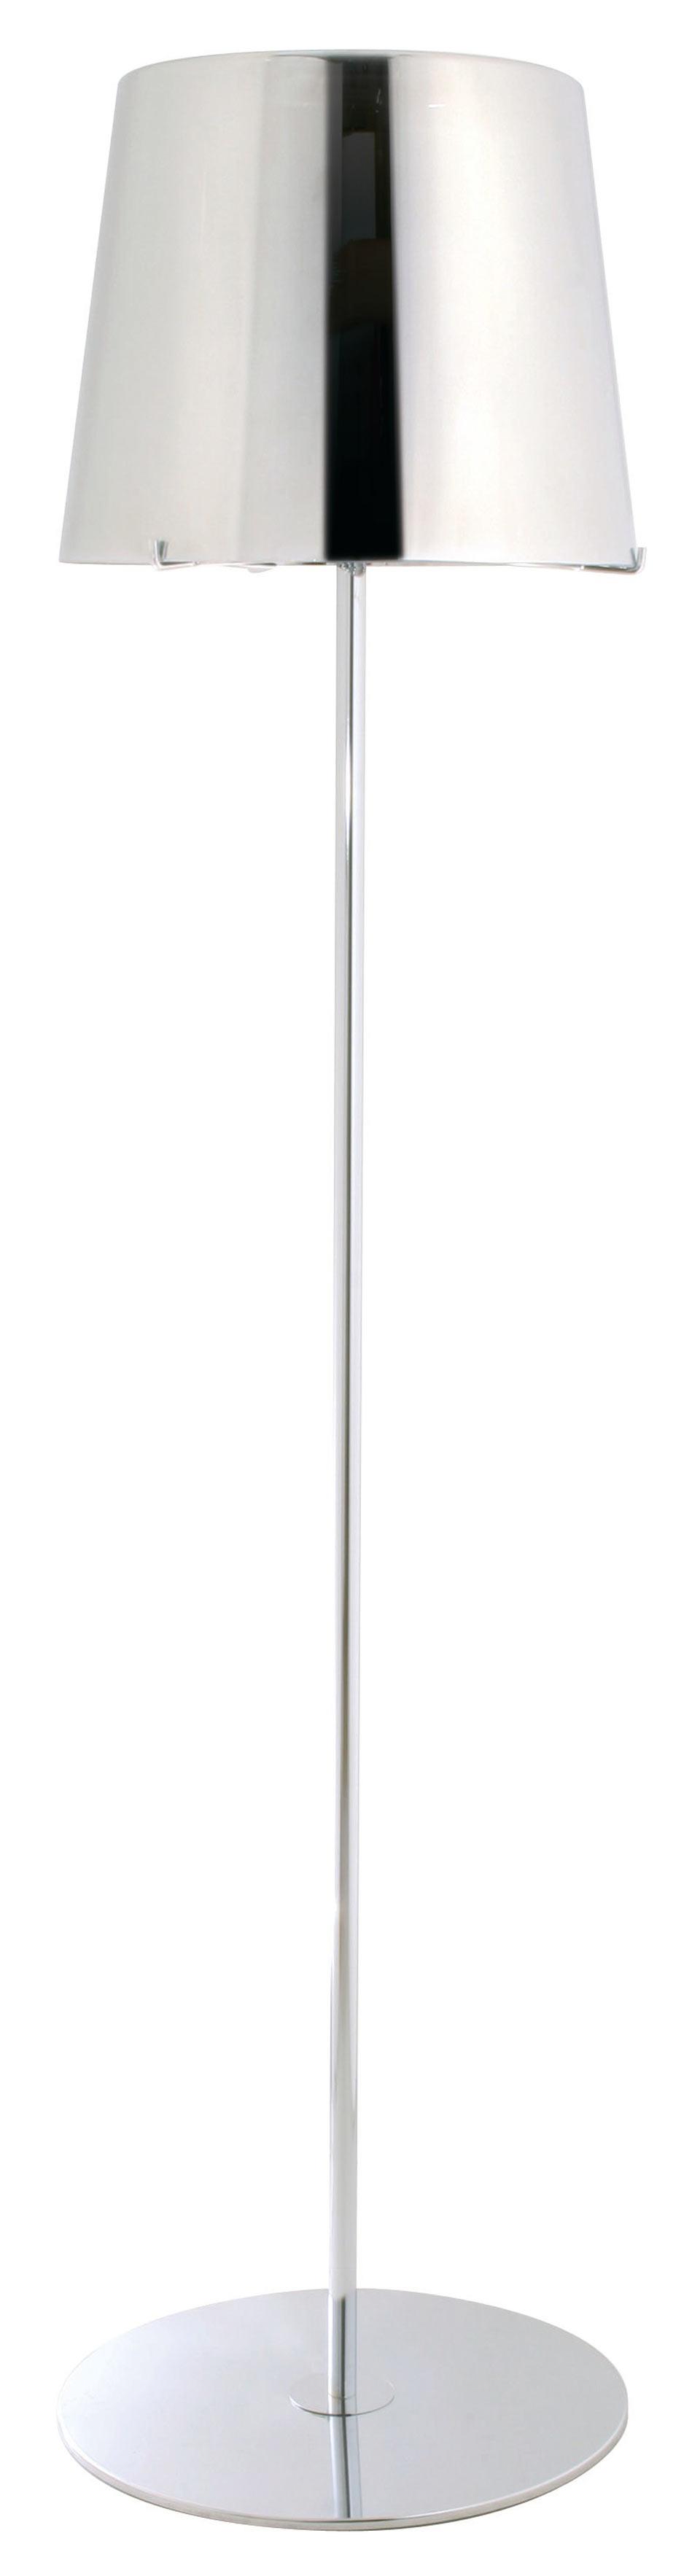 Single lampadaire chrom avec verrerie m tallis e - Lampadaire boule chrome ...